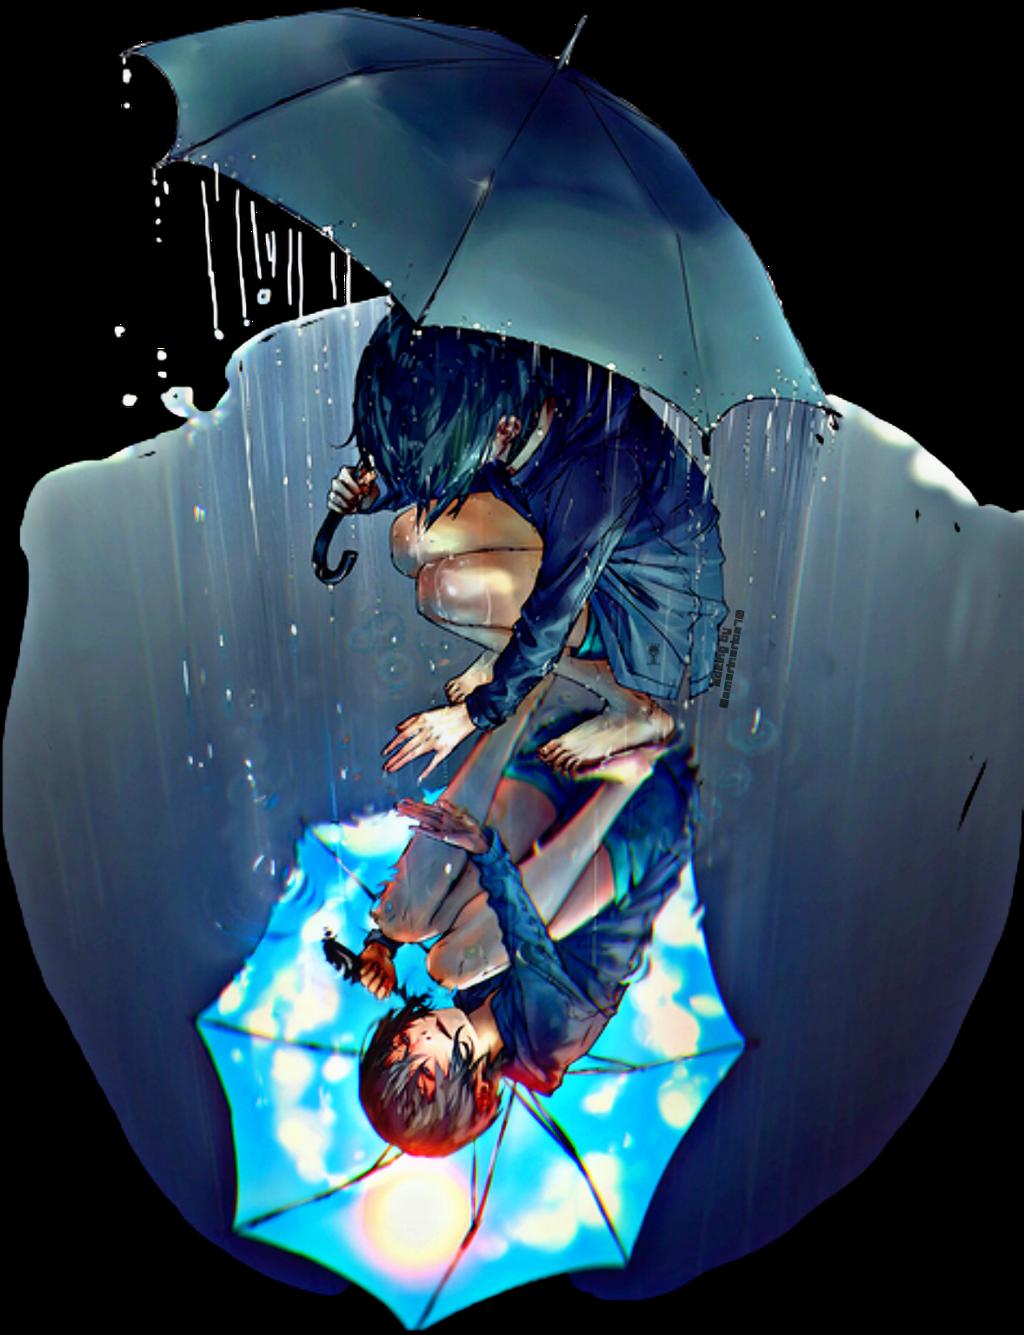 #challenge #umbrella #anime #animegirl #rain #raining #puddle #reflection #picsarteffects #picsartedit #picartstickers #picart @amarinarios70 #freetoedit